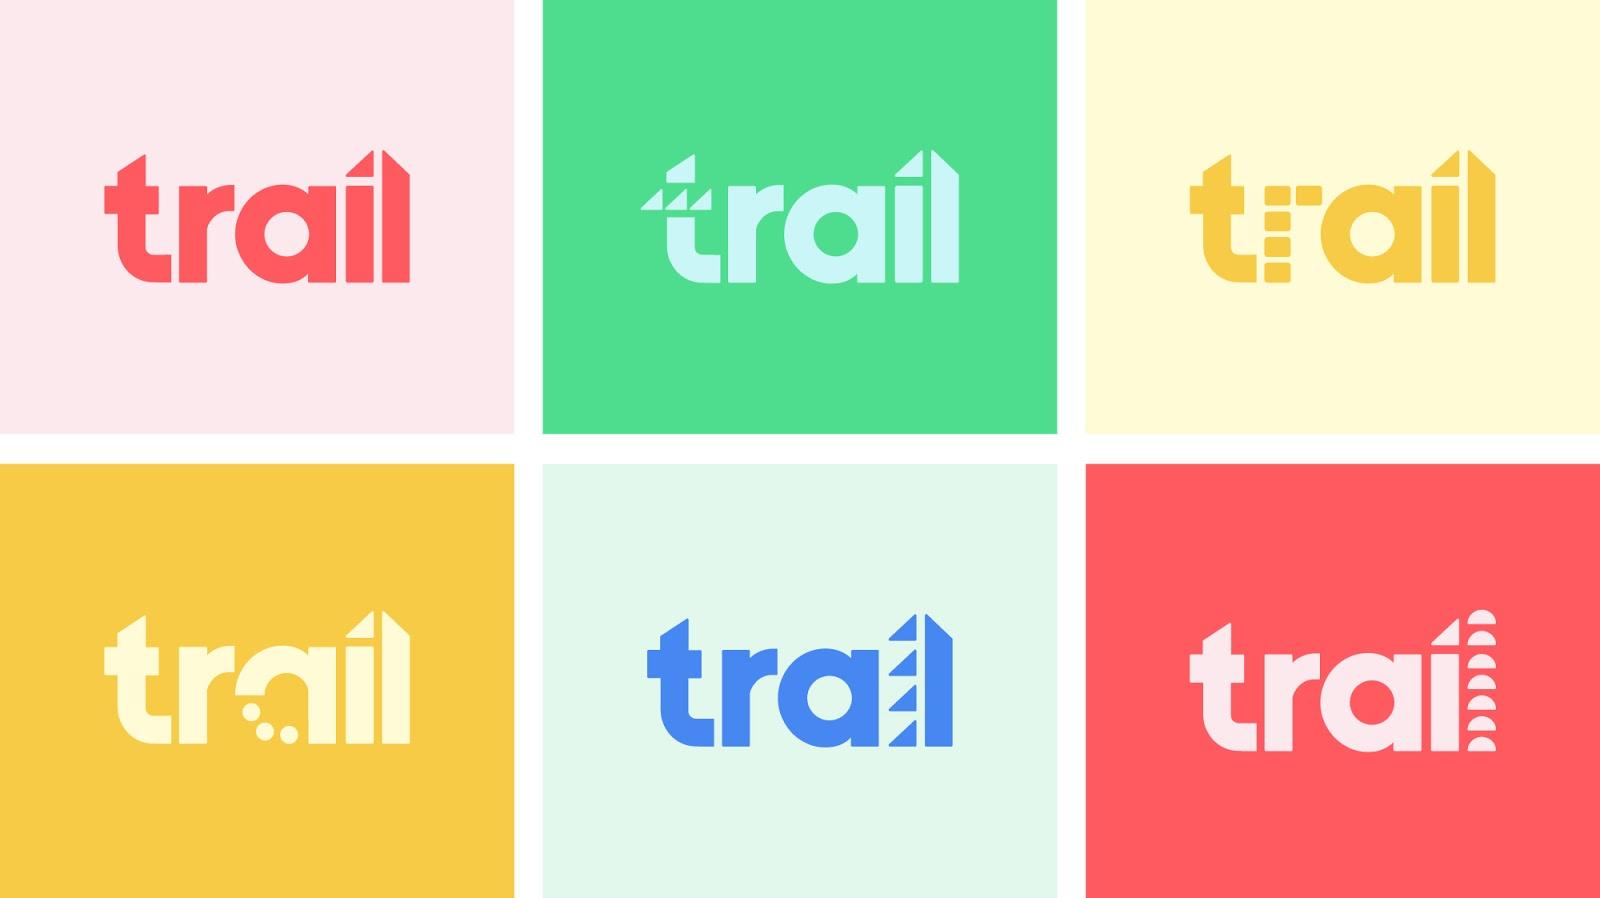 Trail app rebrand